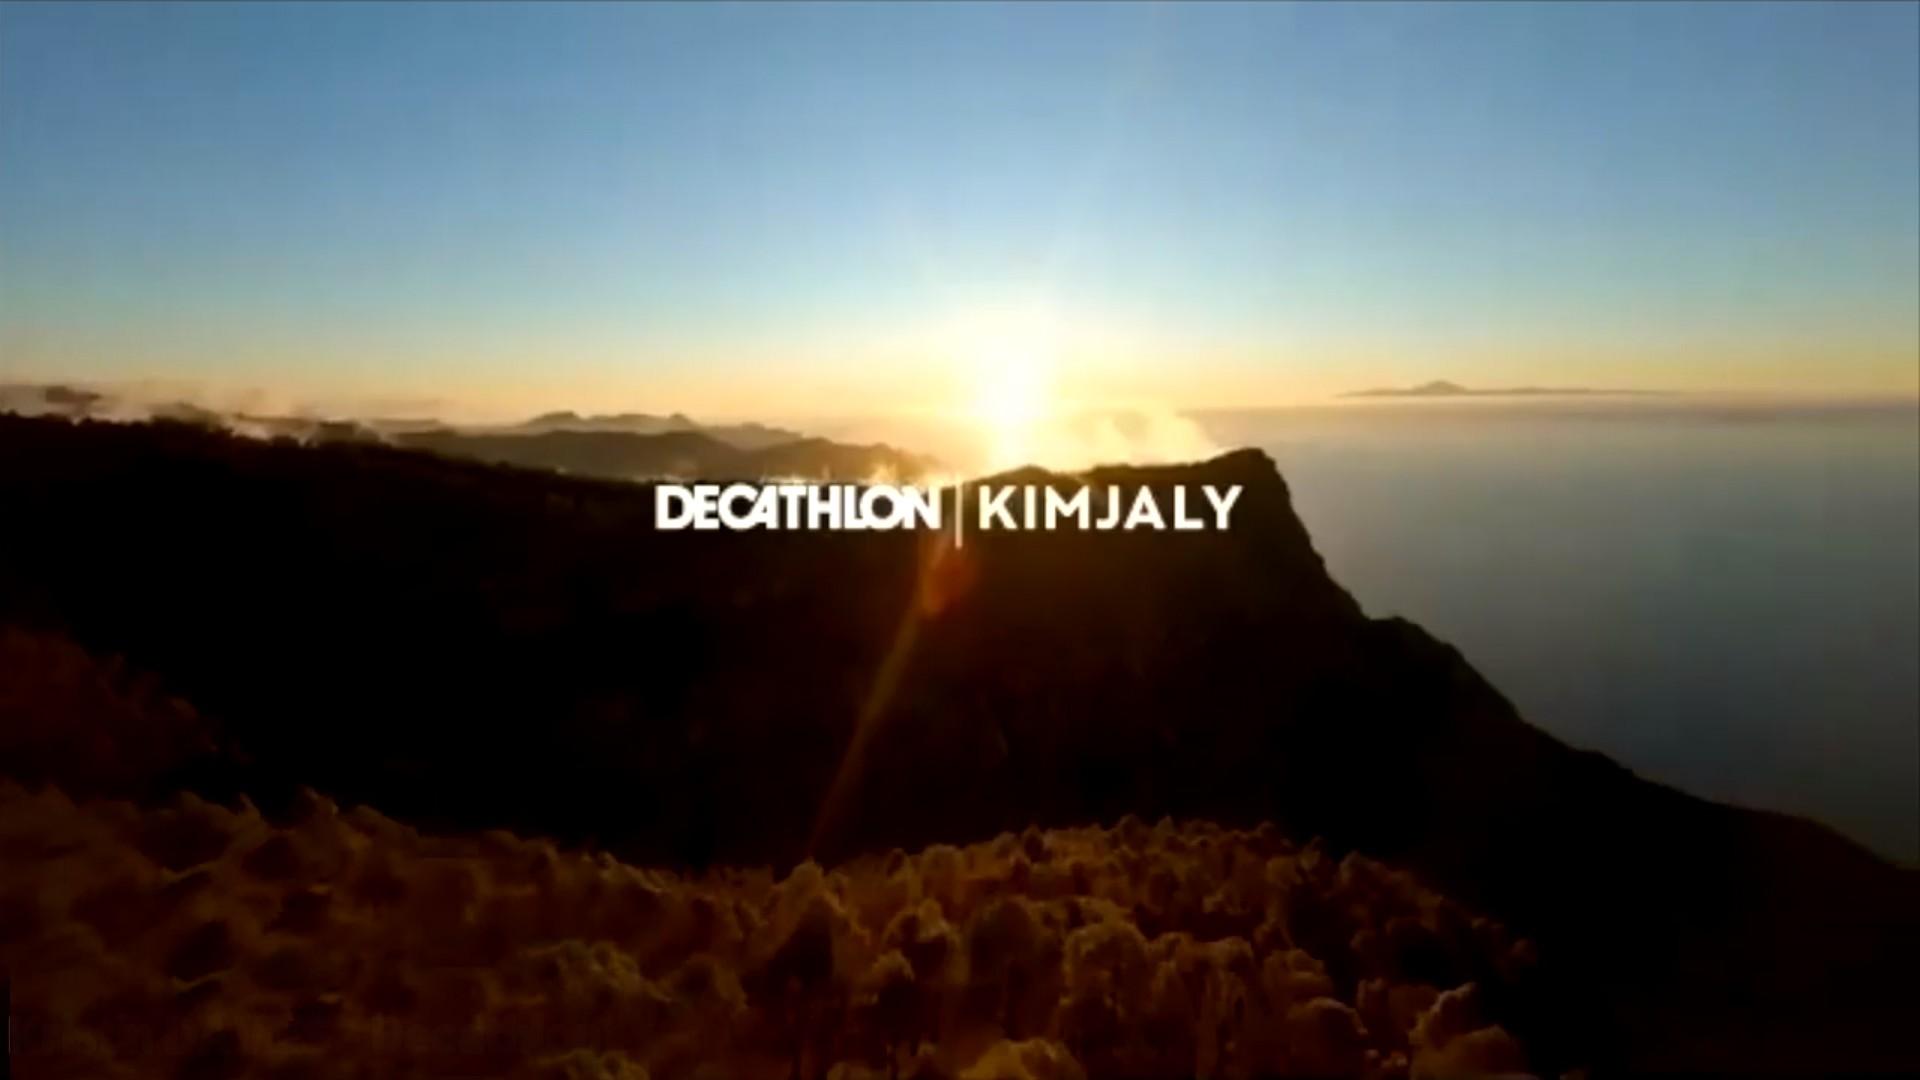 Decathlon Kimjaly Yoga